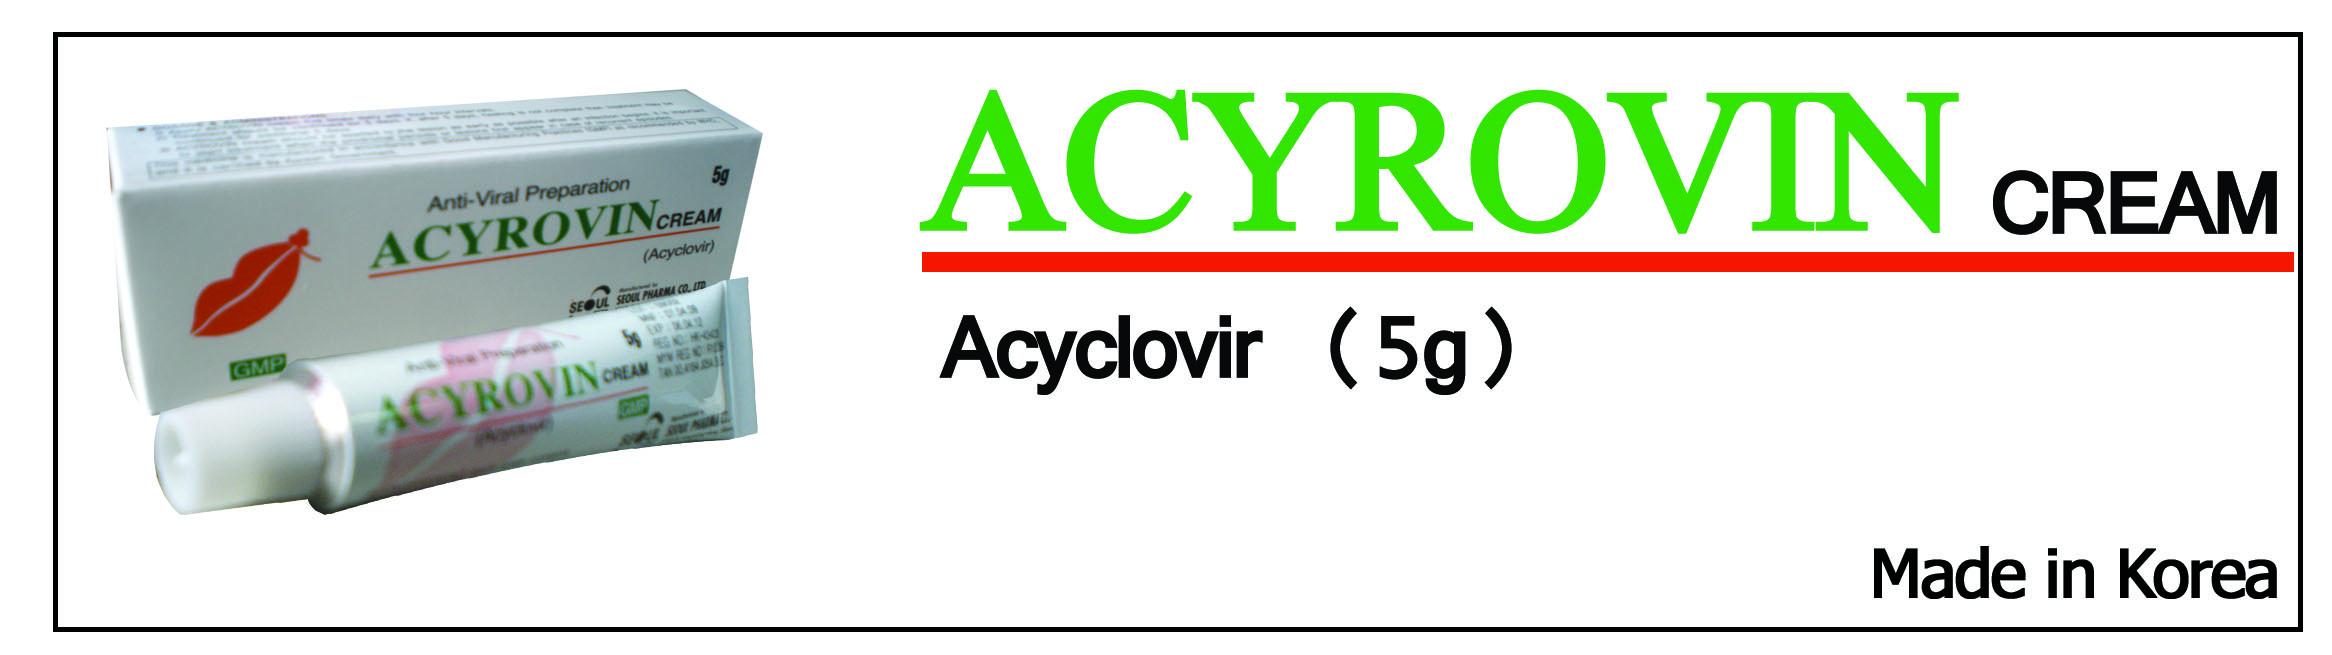 Acyrovin Cream 5g